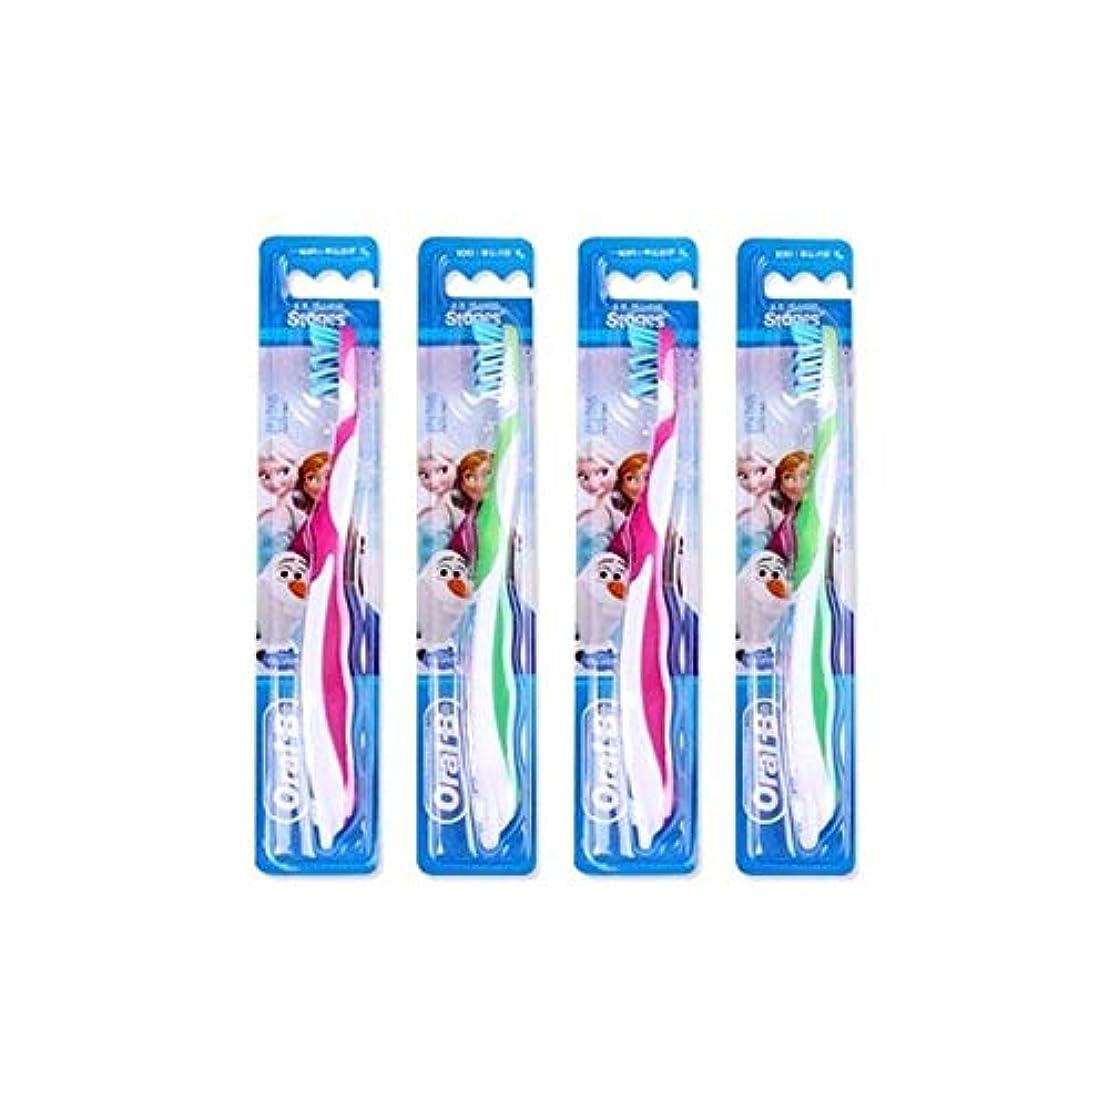 Oral-B Stages 4 Cross Action Pro-Expert 子供用歯ブラシ 4 Pcs/Genuine [並行輸入品]